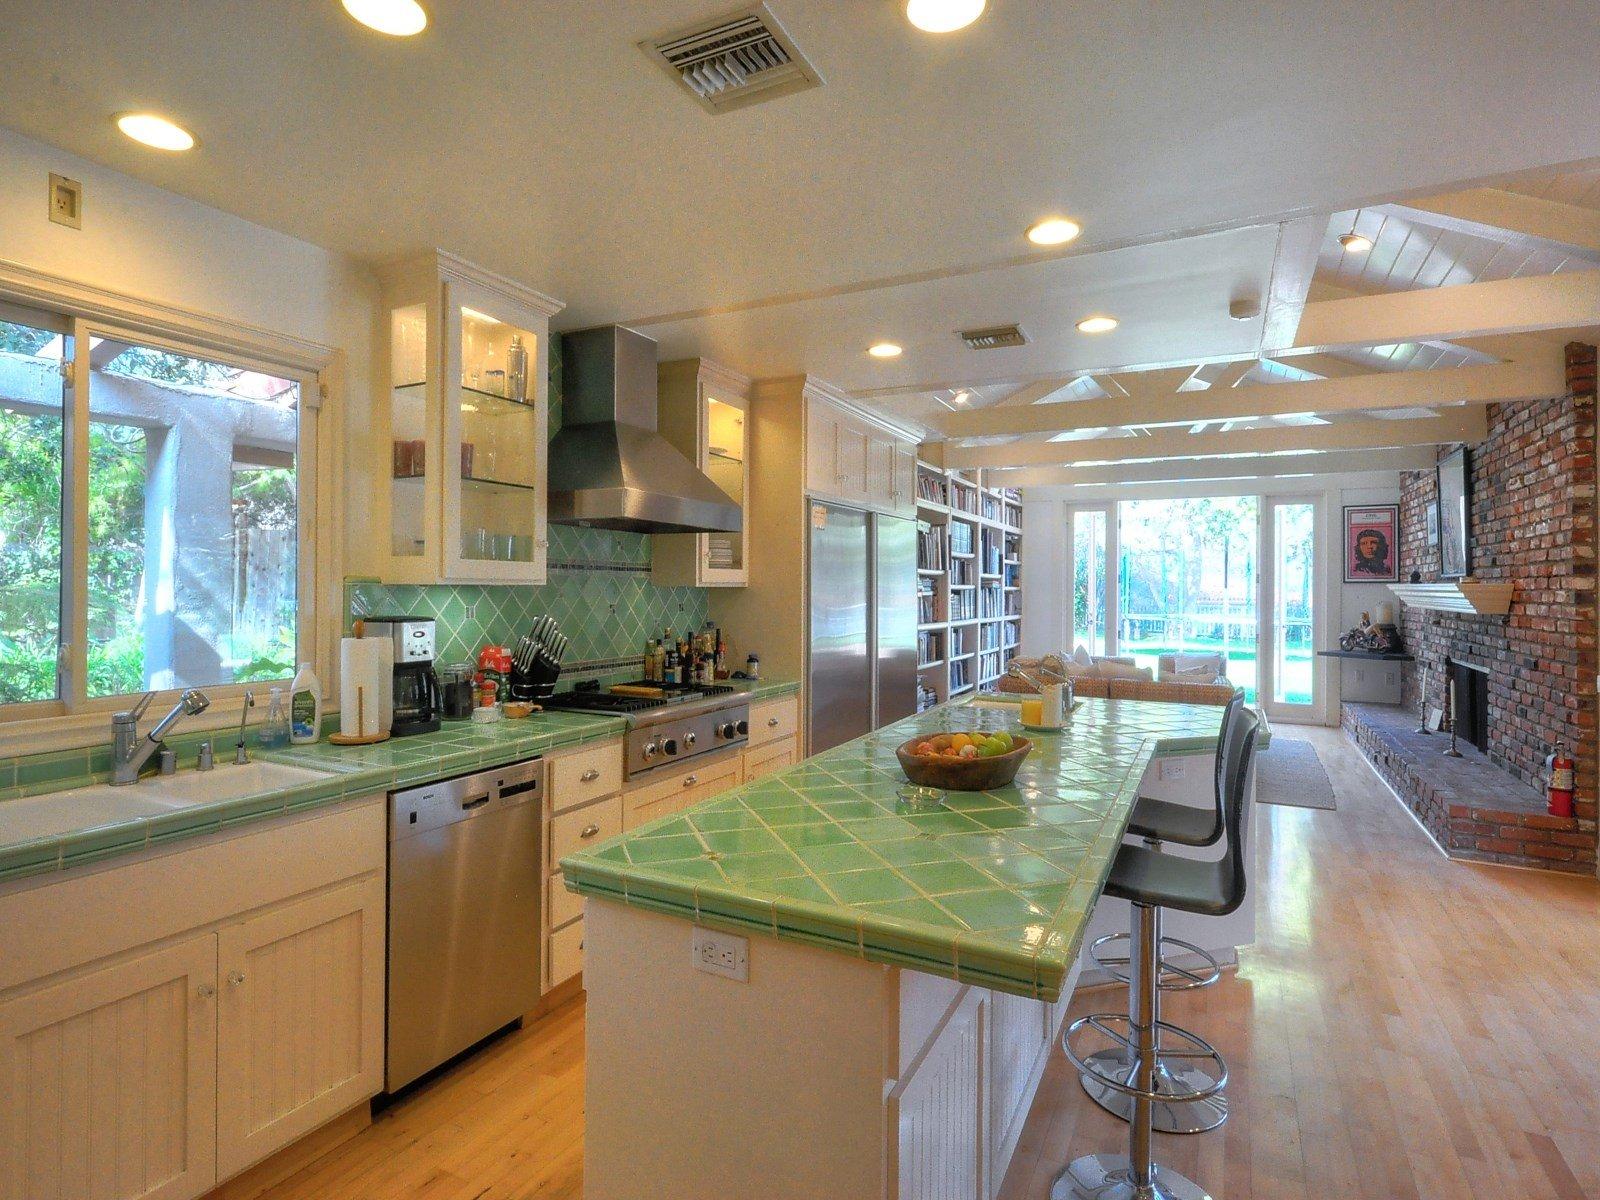 Refreshing Green Countertops And Beadboard Cabinets   Sean Penn Malibu Home   Sothebyshomes